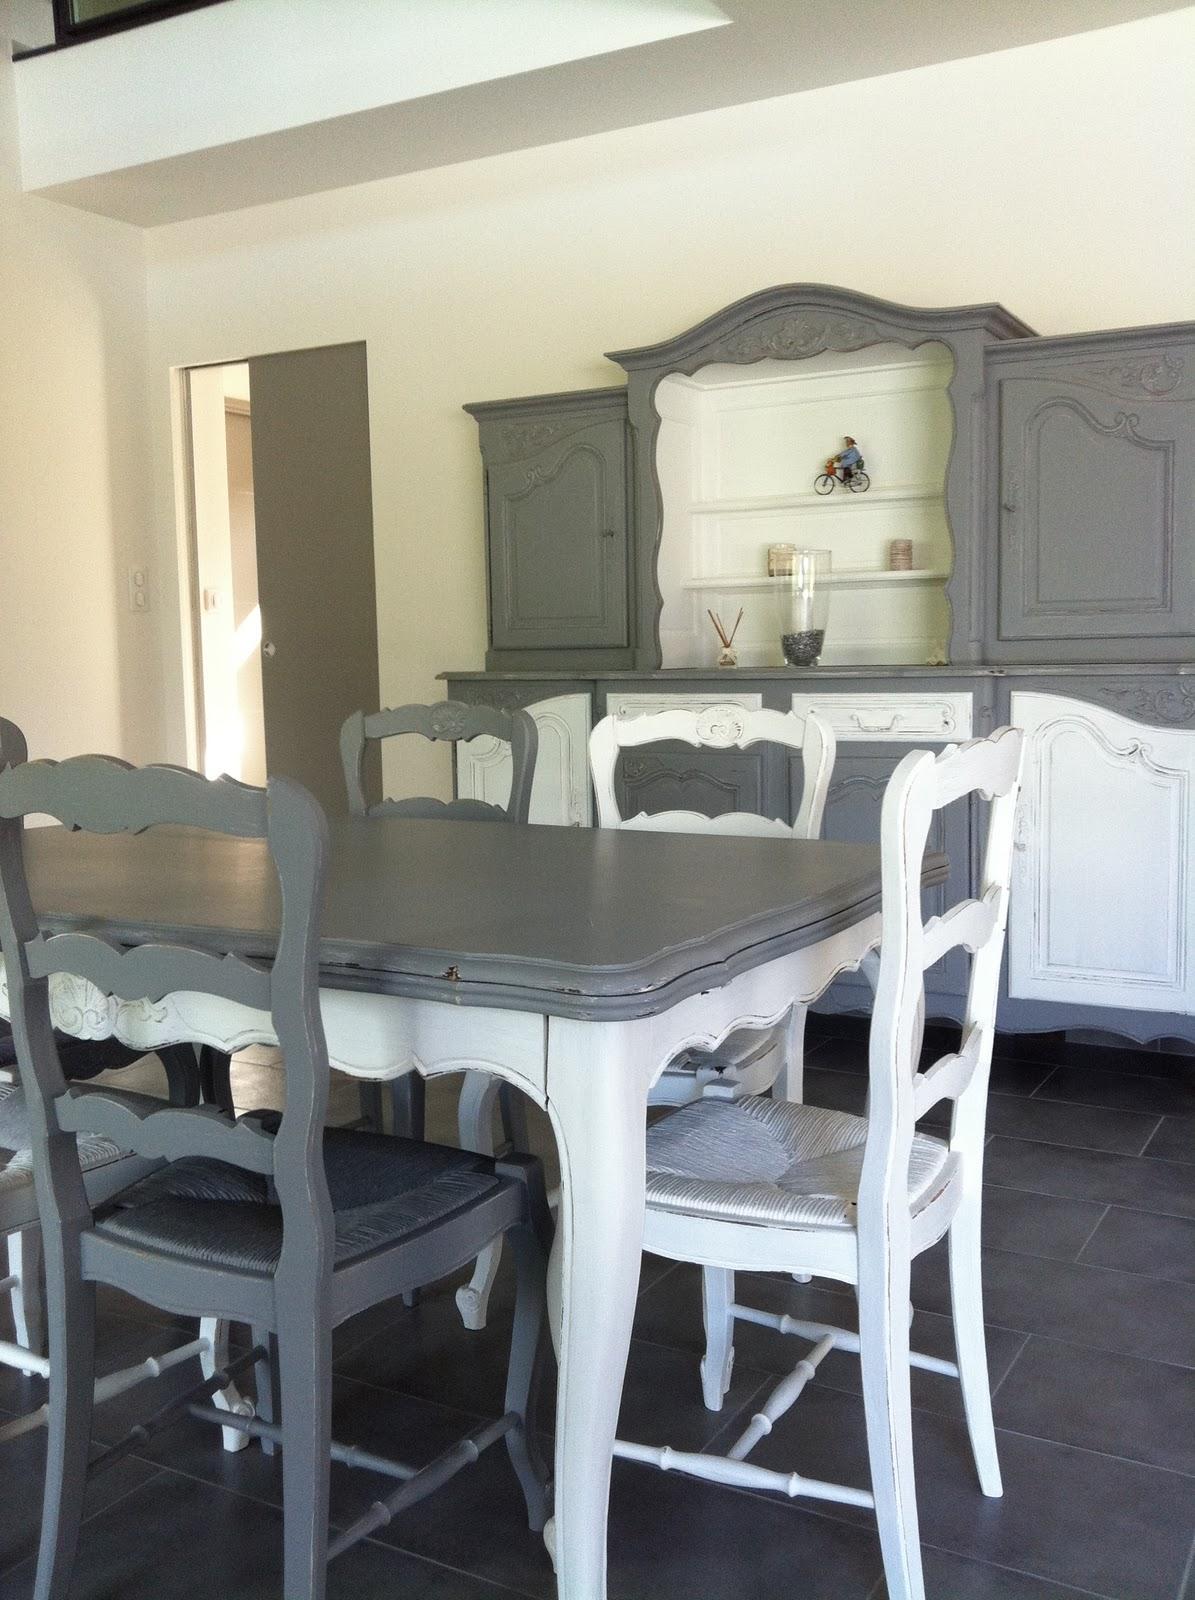 meubles anciens relookes. Black Bedroom Furniture Sets. Home Design Ideas